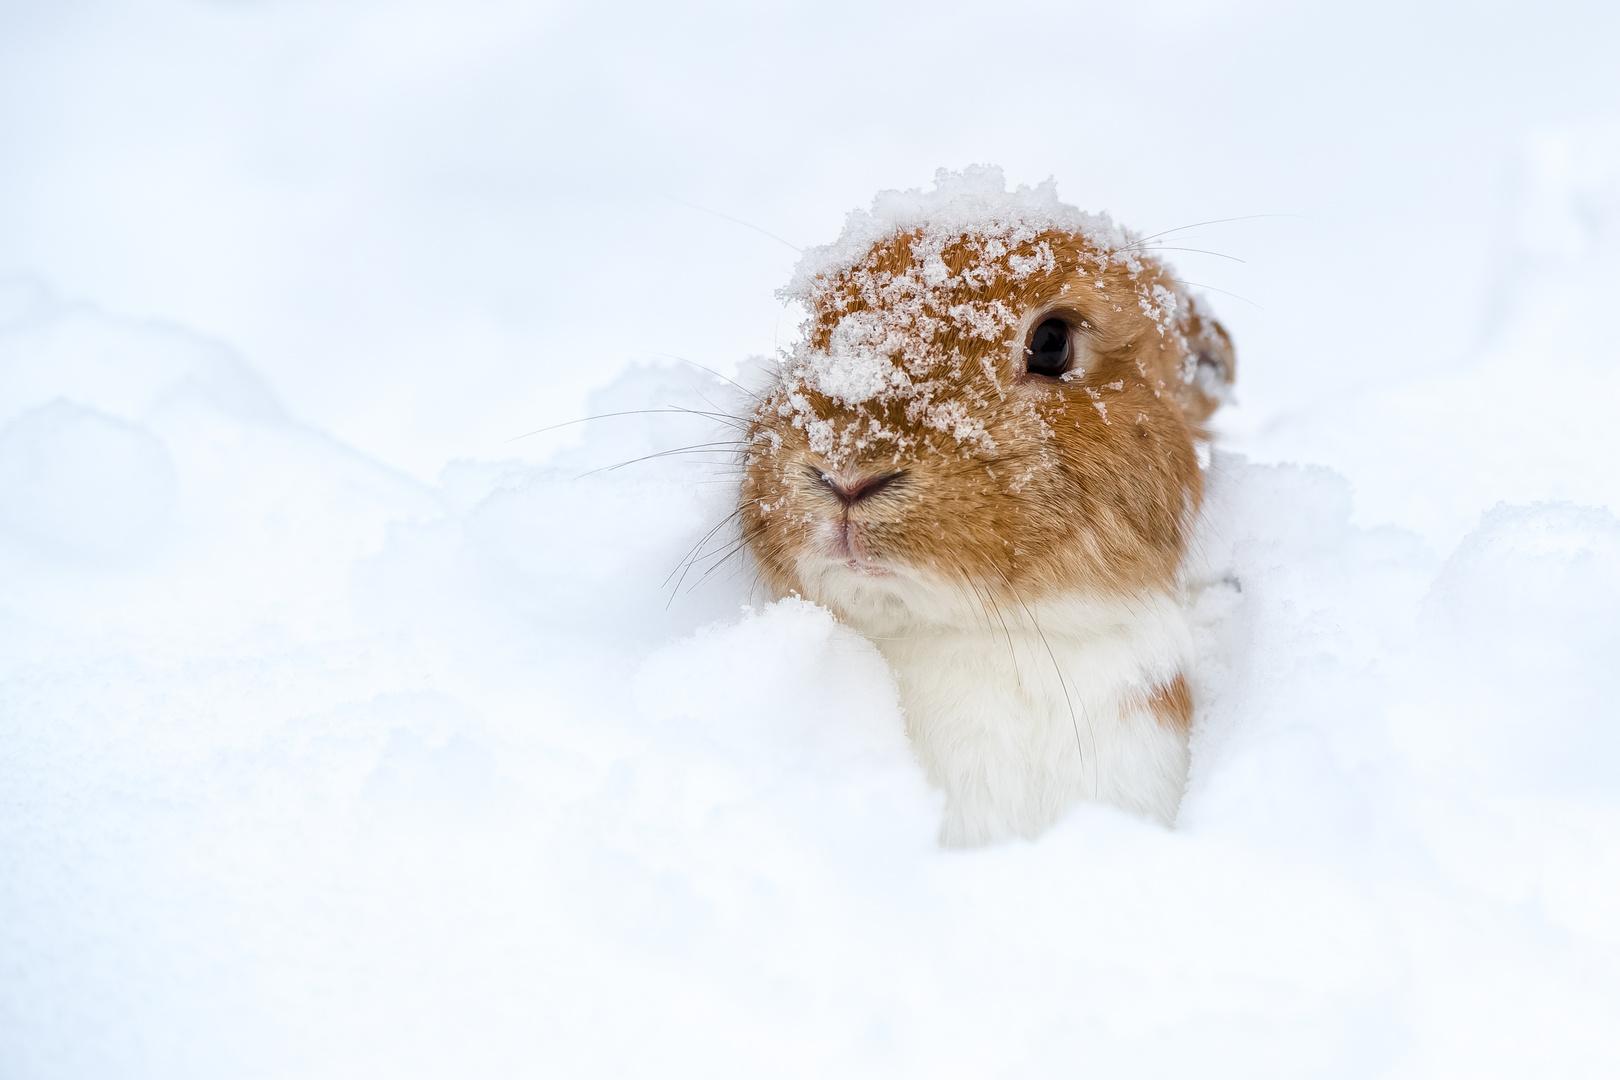 ...Pebbles im Schnee...